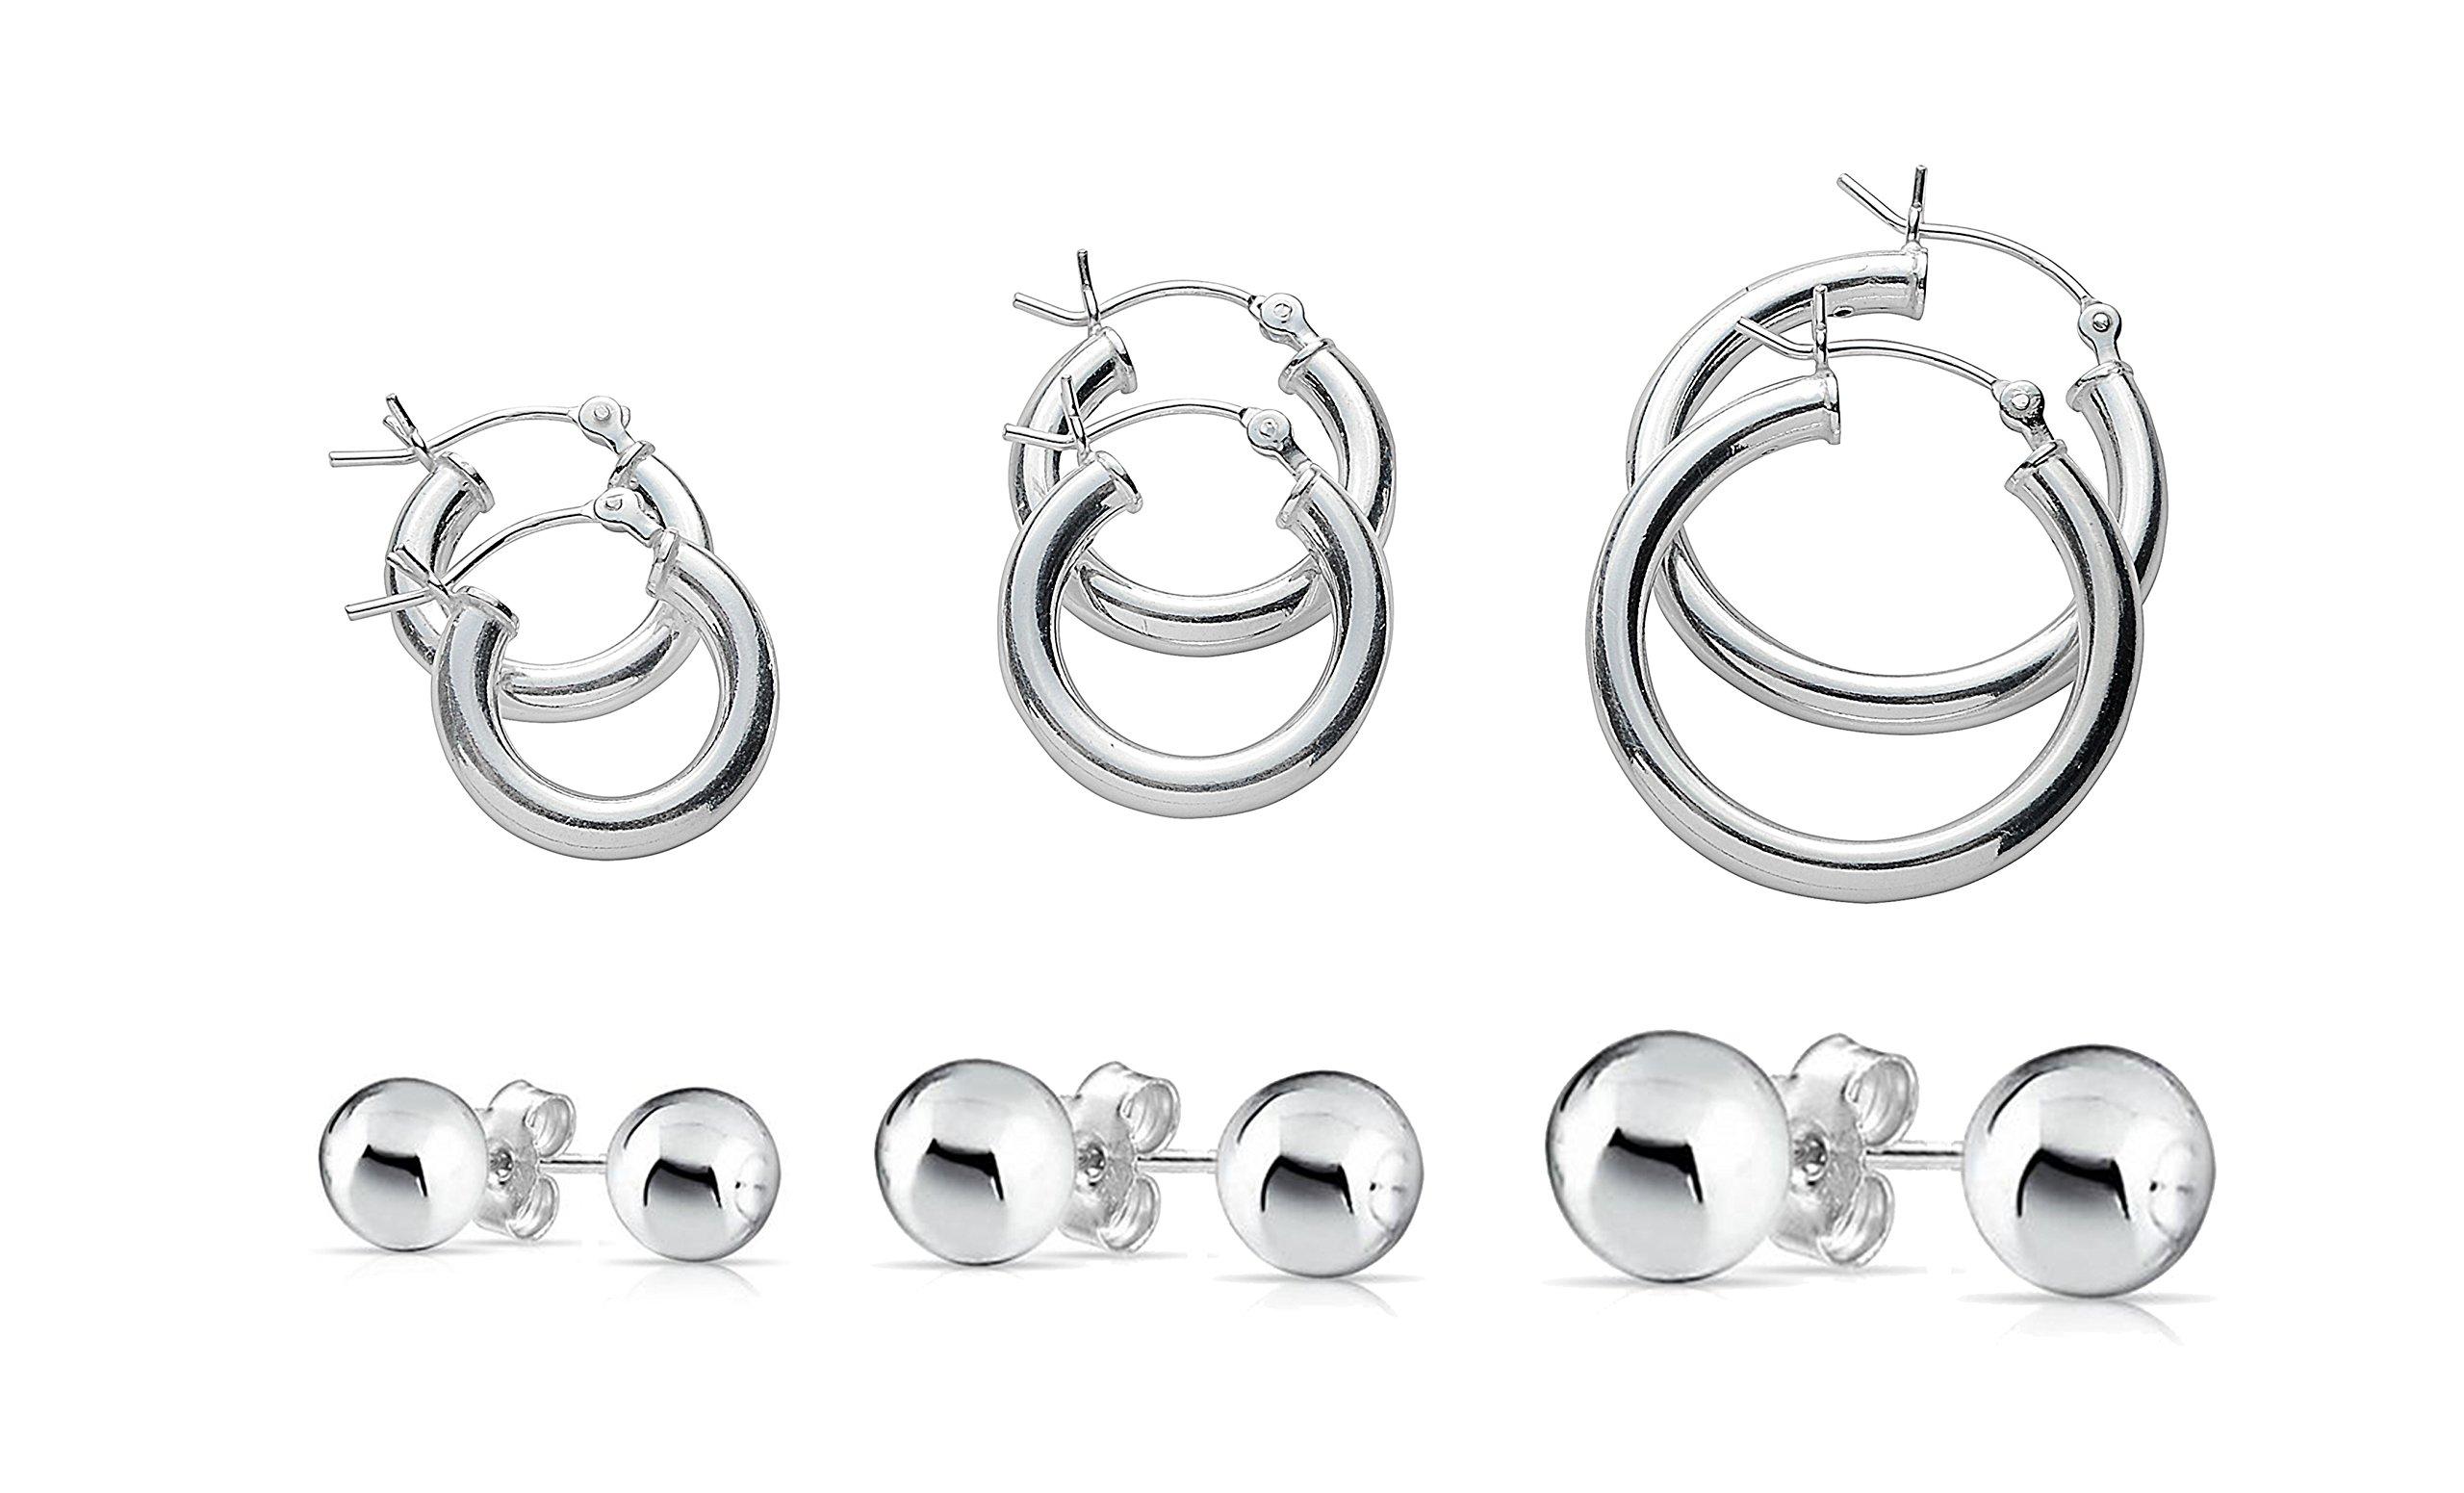 NYC Sterling 6 Pair Italian Hoop and Ball Stud Earrings in Sterling Silver (sterling-silver)